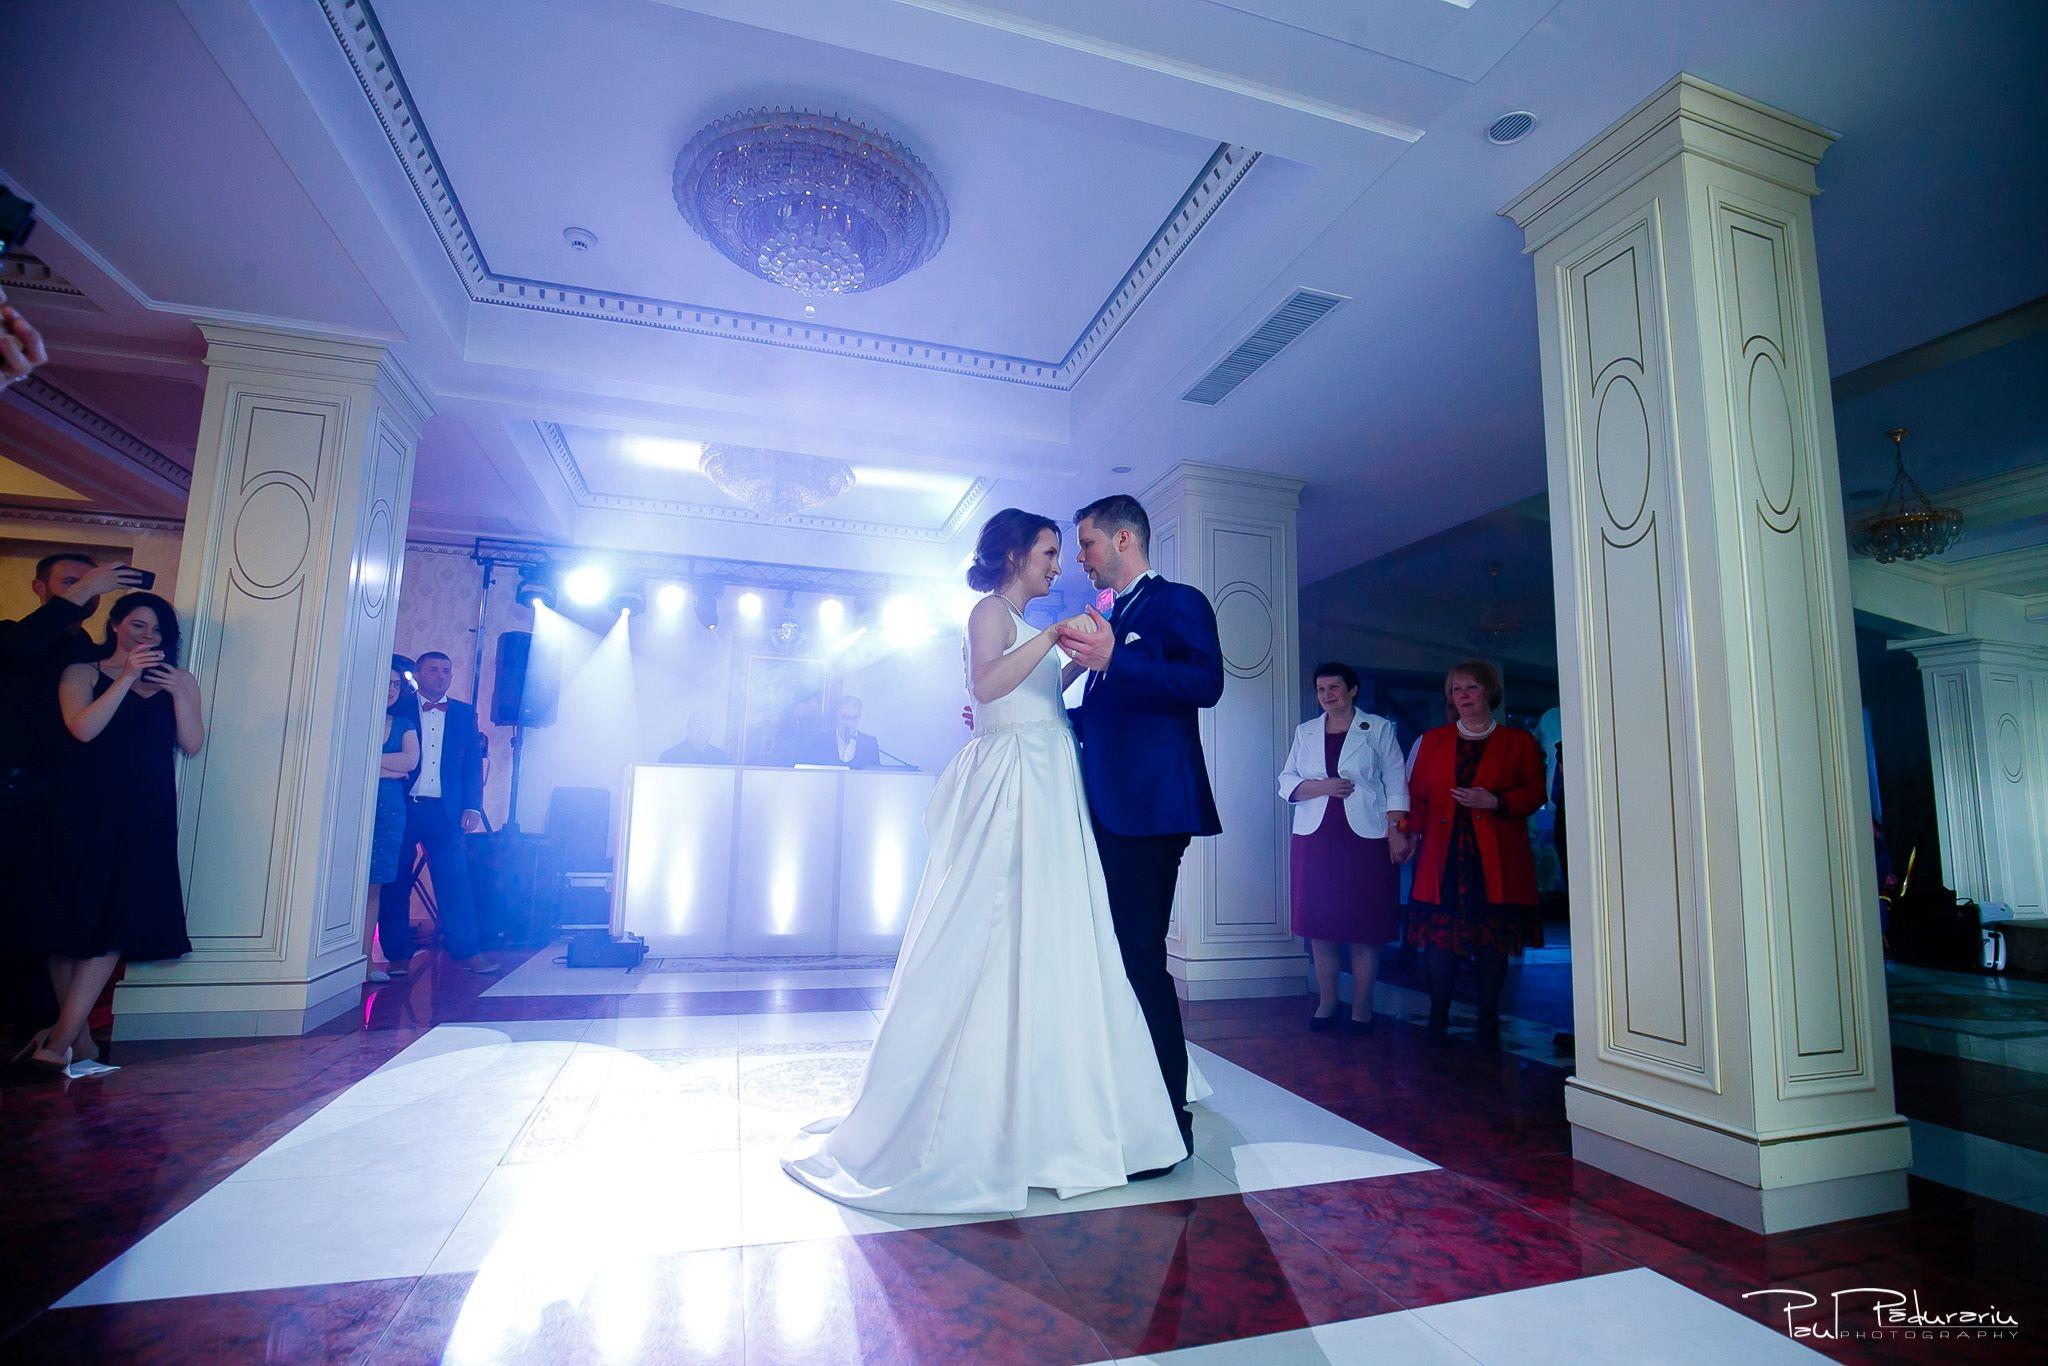 Alex si Natalia nunta Sala Regala La Castel Iasi - fotograf profesionist nunta iasi Paul Padurariu 2019 16